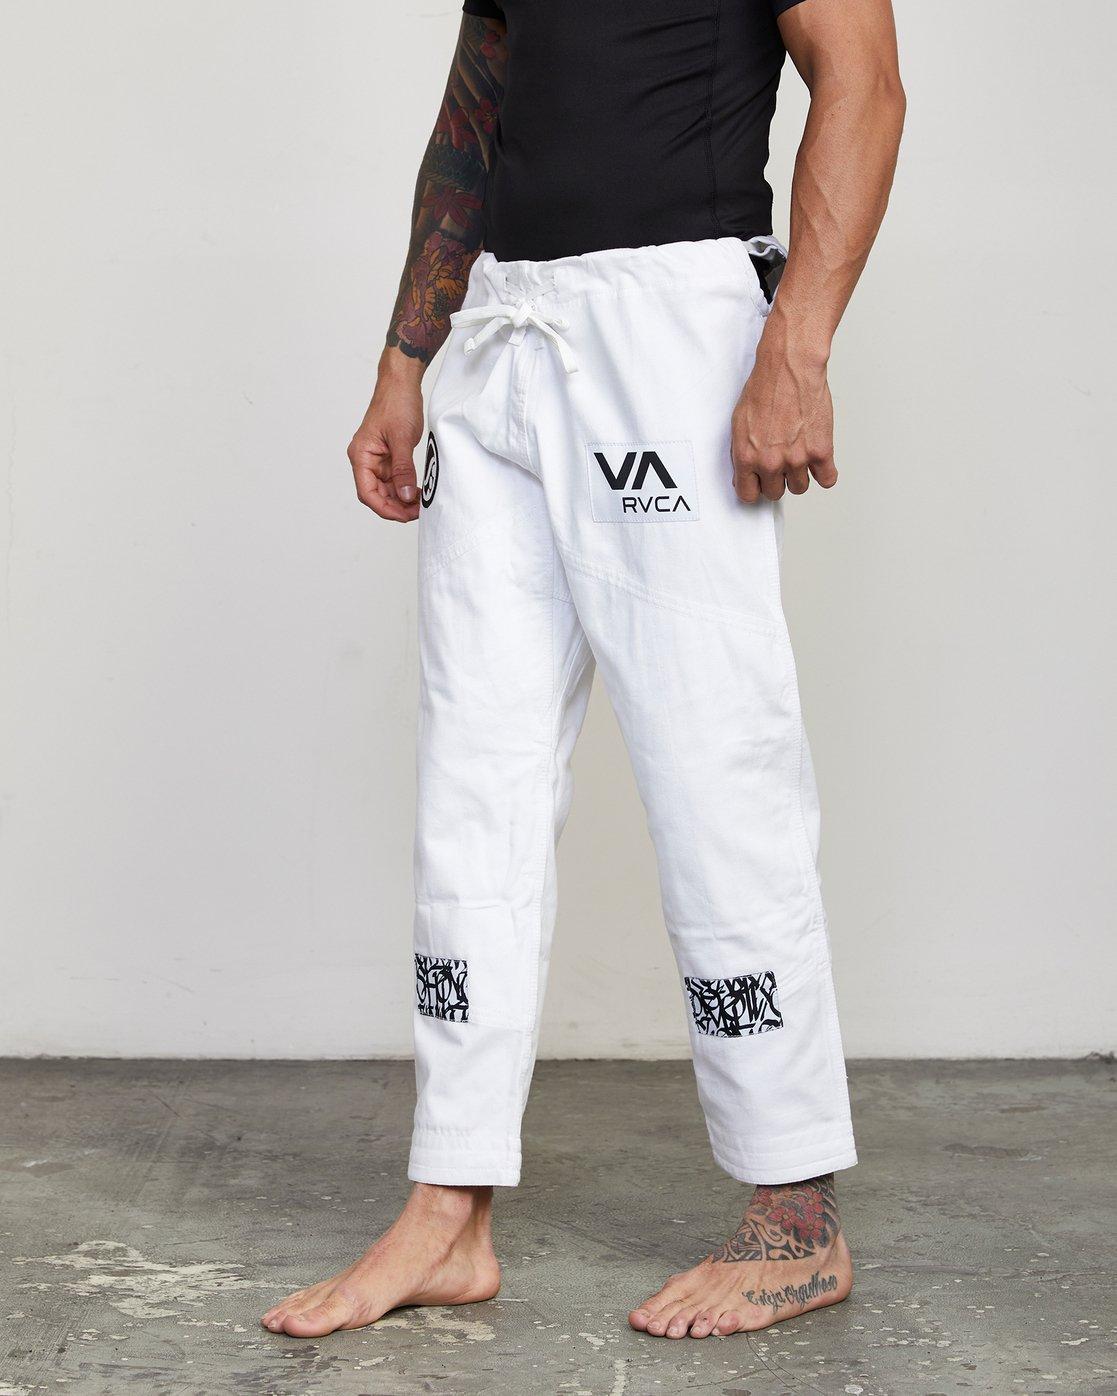 5 RVCA Shoyoroll - Jiu-Jitsu Gi for Men White S4ESRARVP0 RVCA